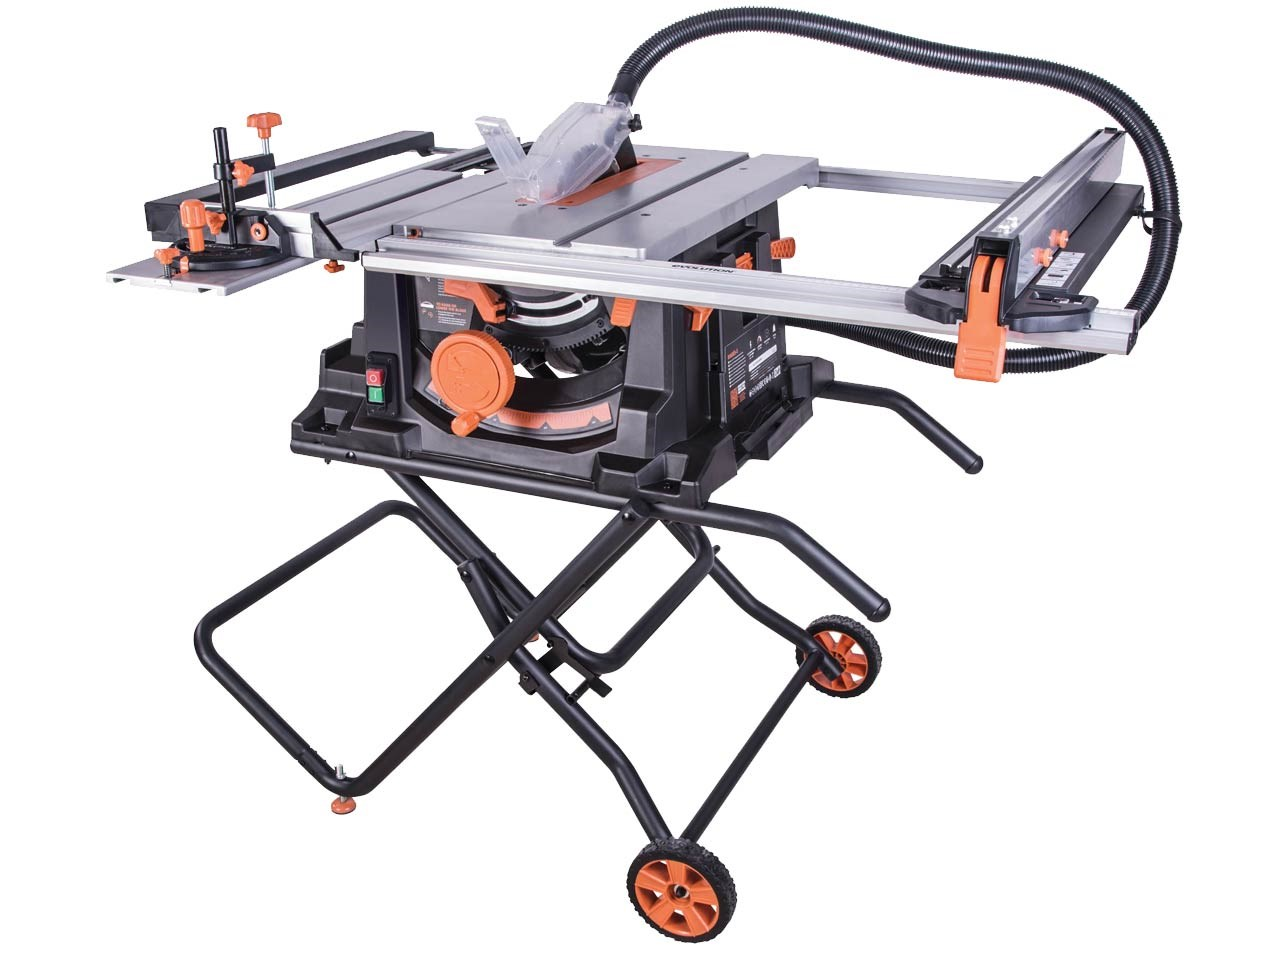 Multipurpose Table evolution rage5-s/1 110v 255mm tct multipurpose table saw